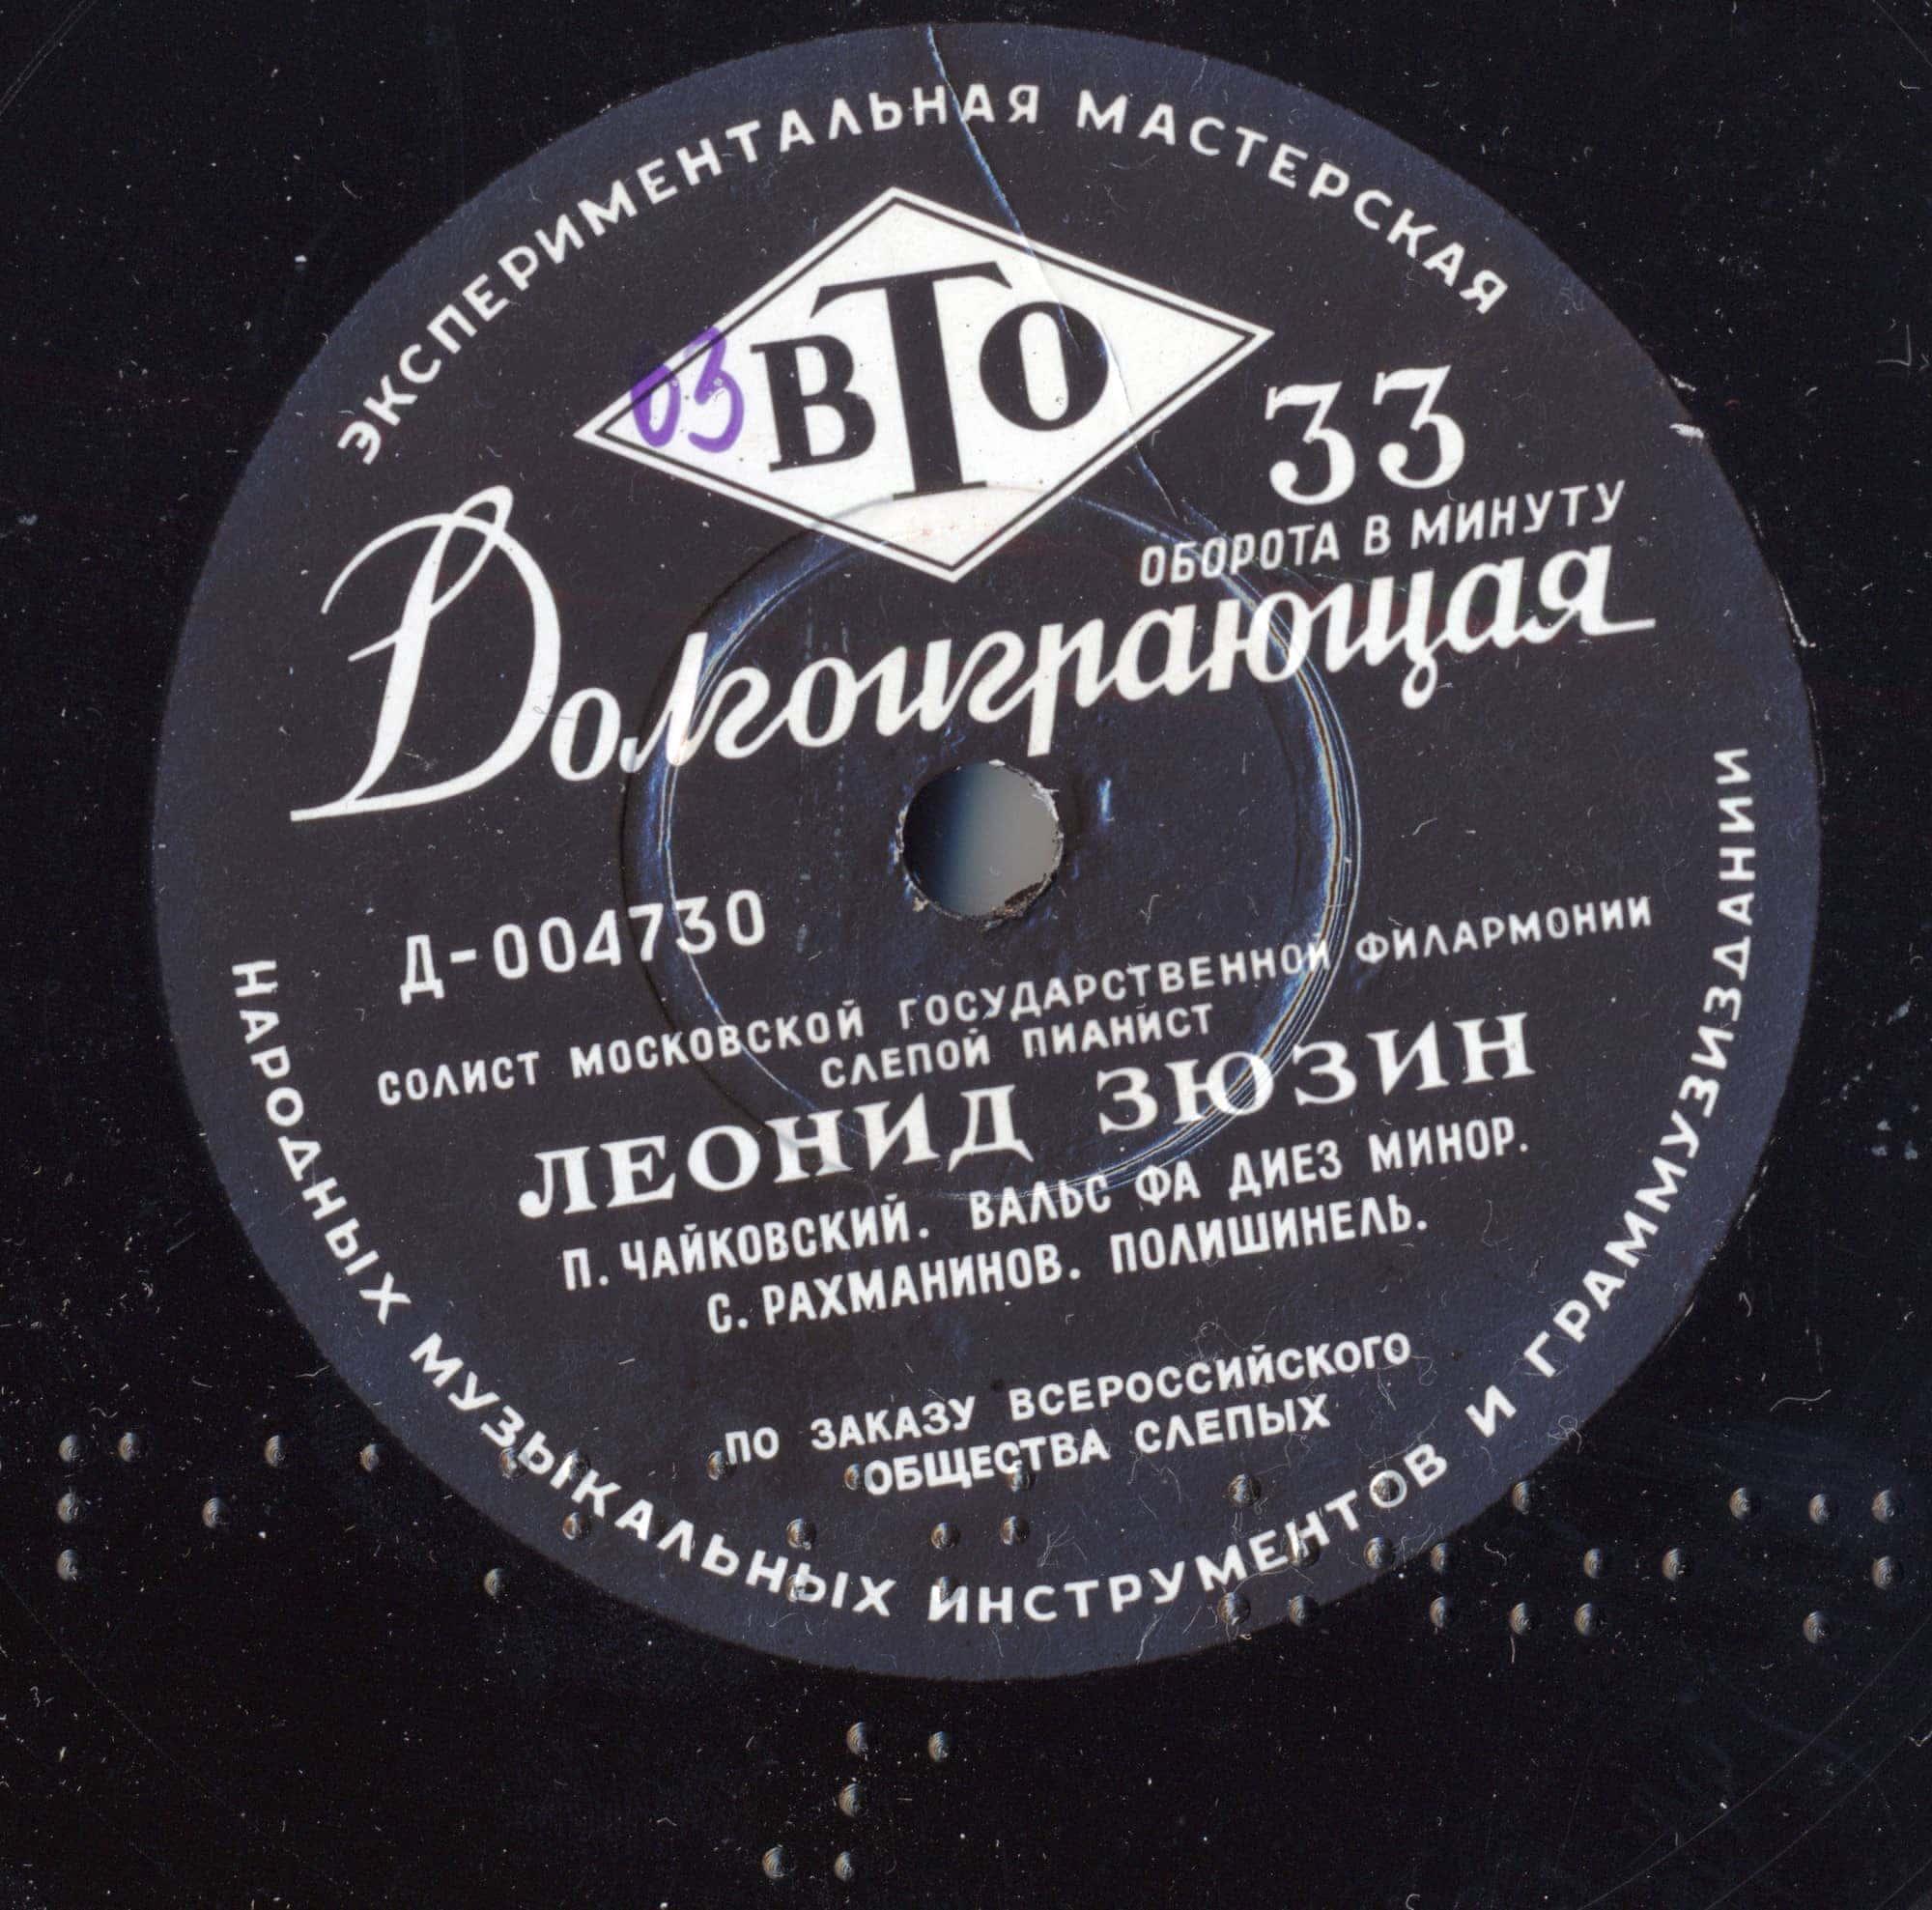 Грампластинка с записями Леонида Зюзина